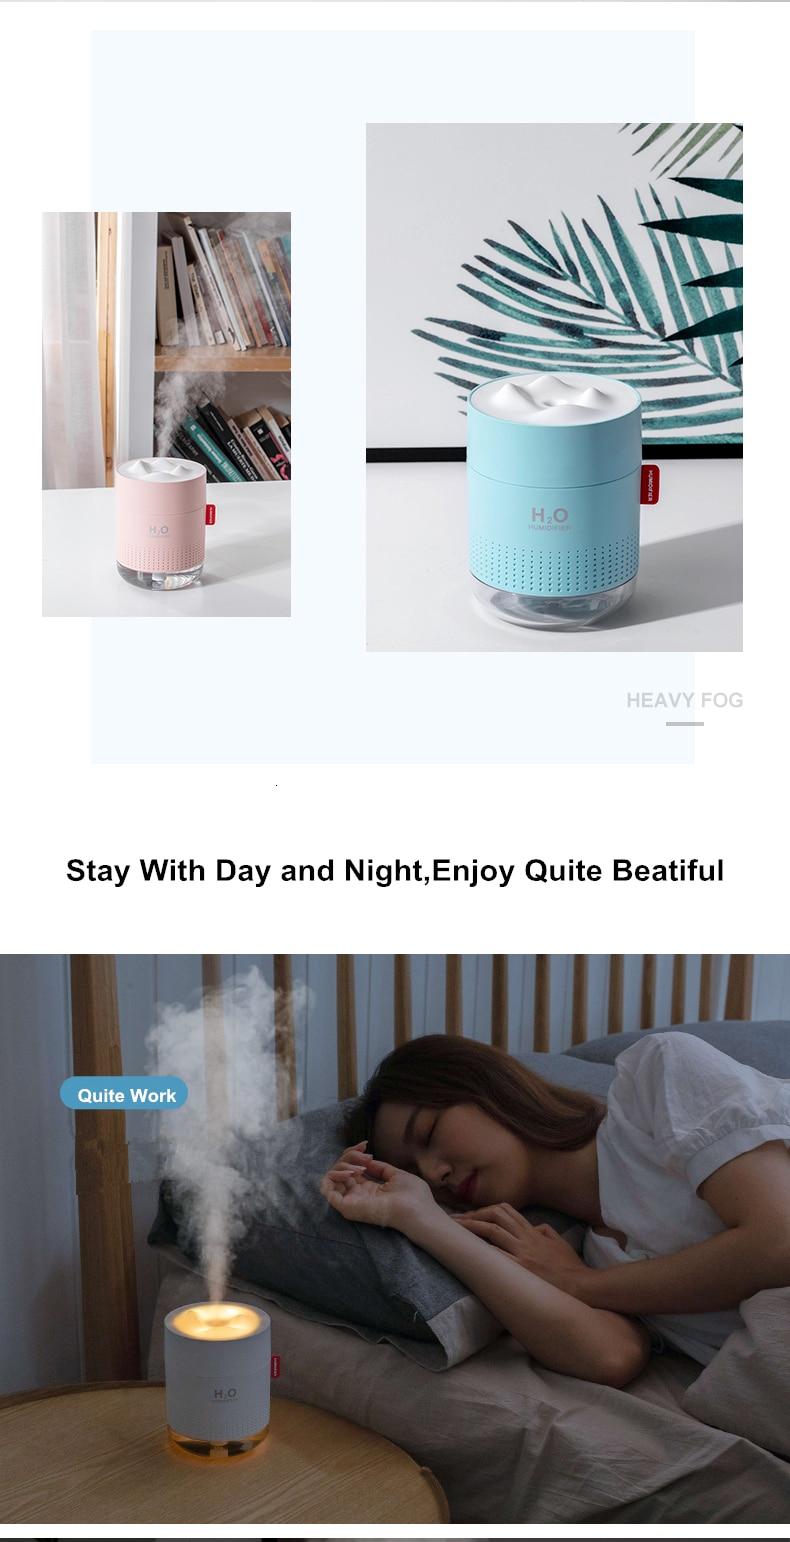 H6dff789ad6c6480488cb802e2cd1046d9 - Portable Ultrasonic Humidifier 500ML Snow Mountain H2O USB Aroma Air Diffuser With Romantic Night Lamp Humidificador Difusor